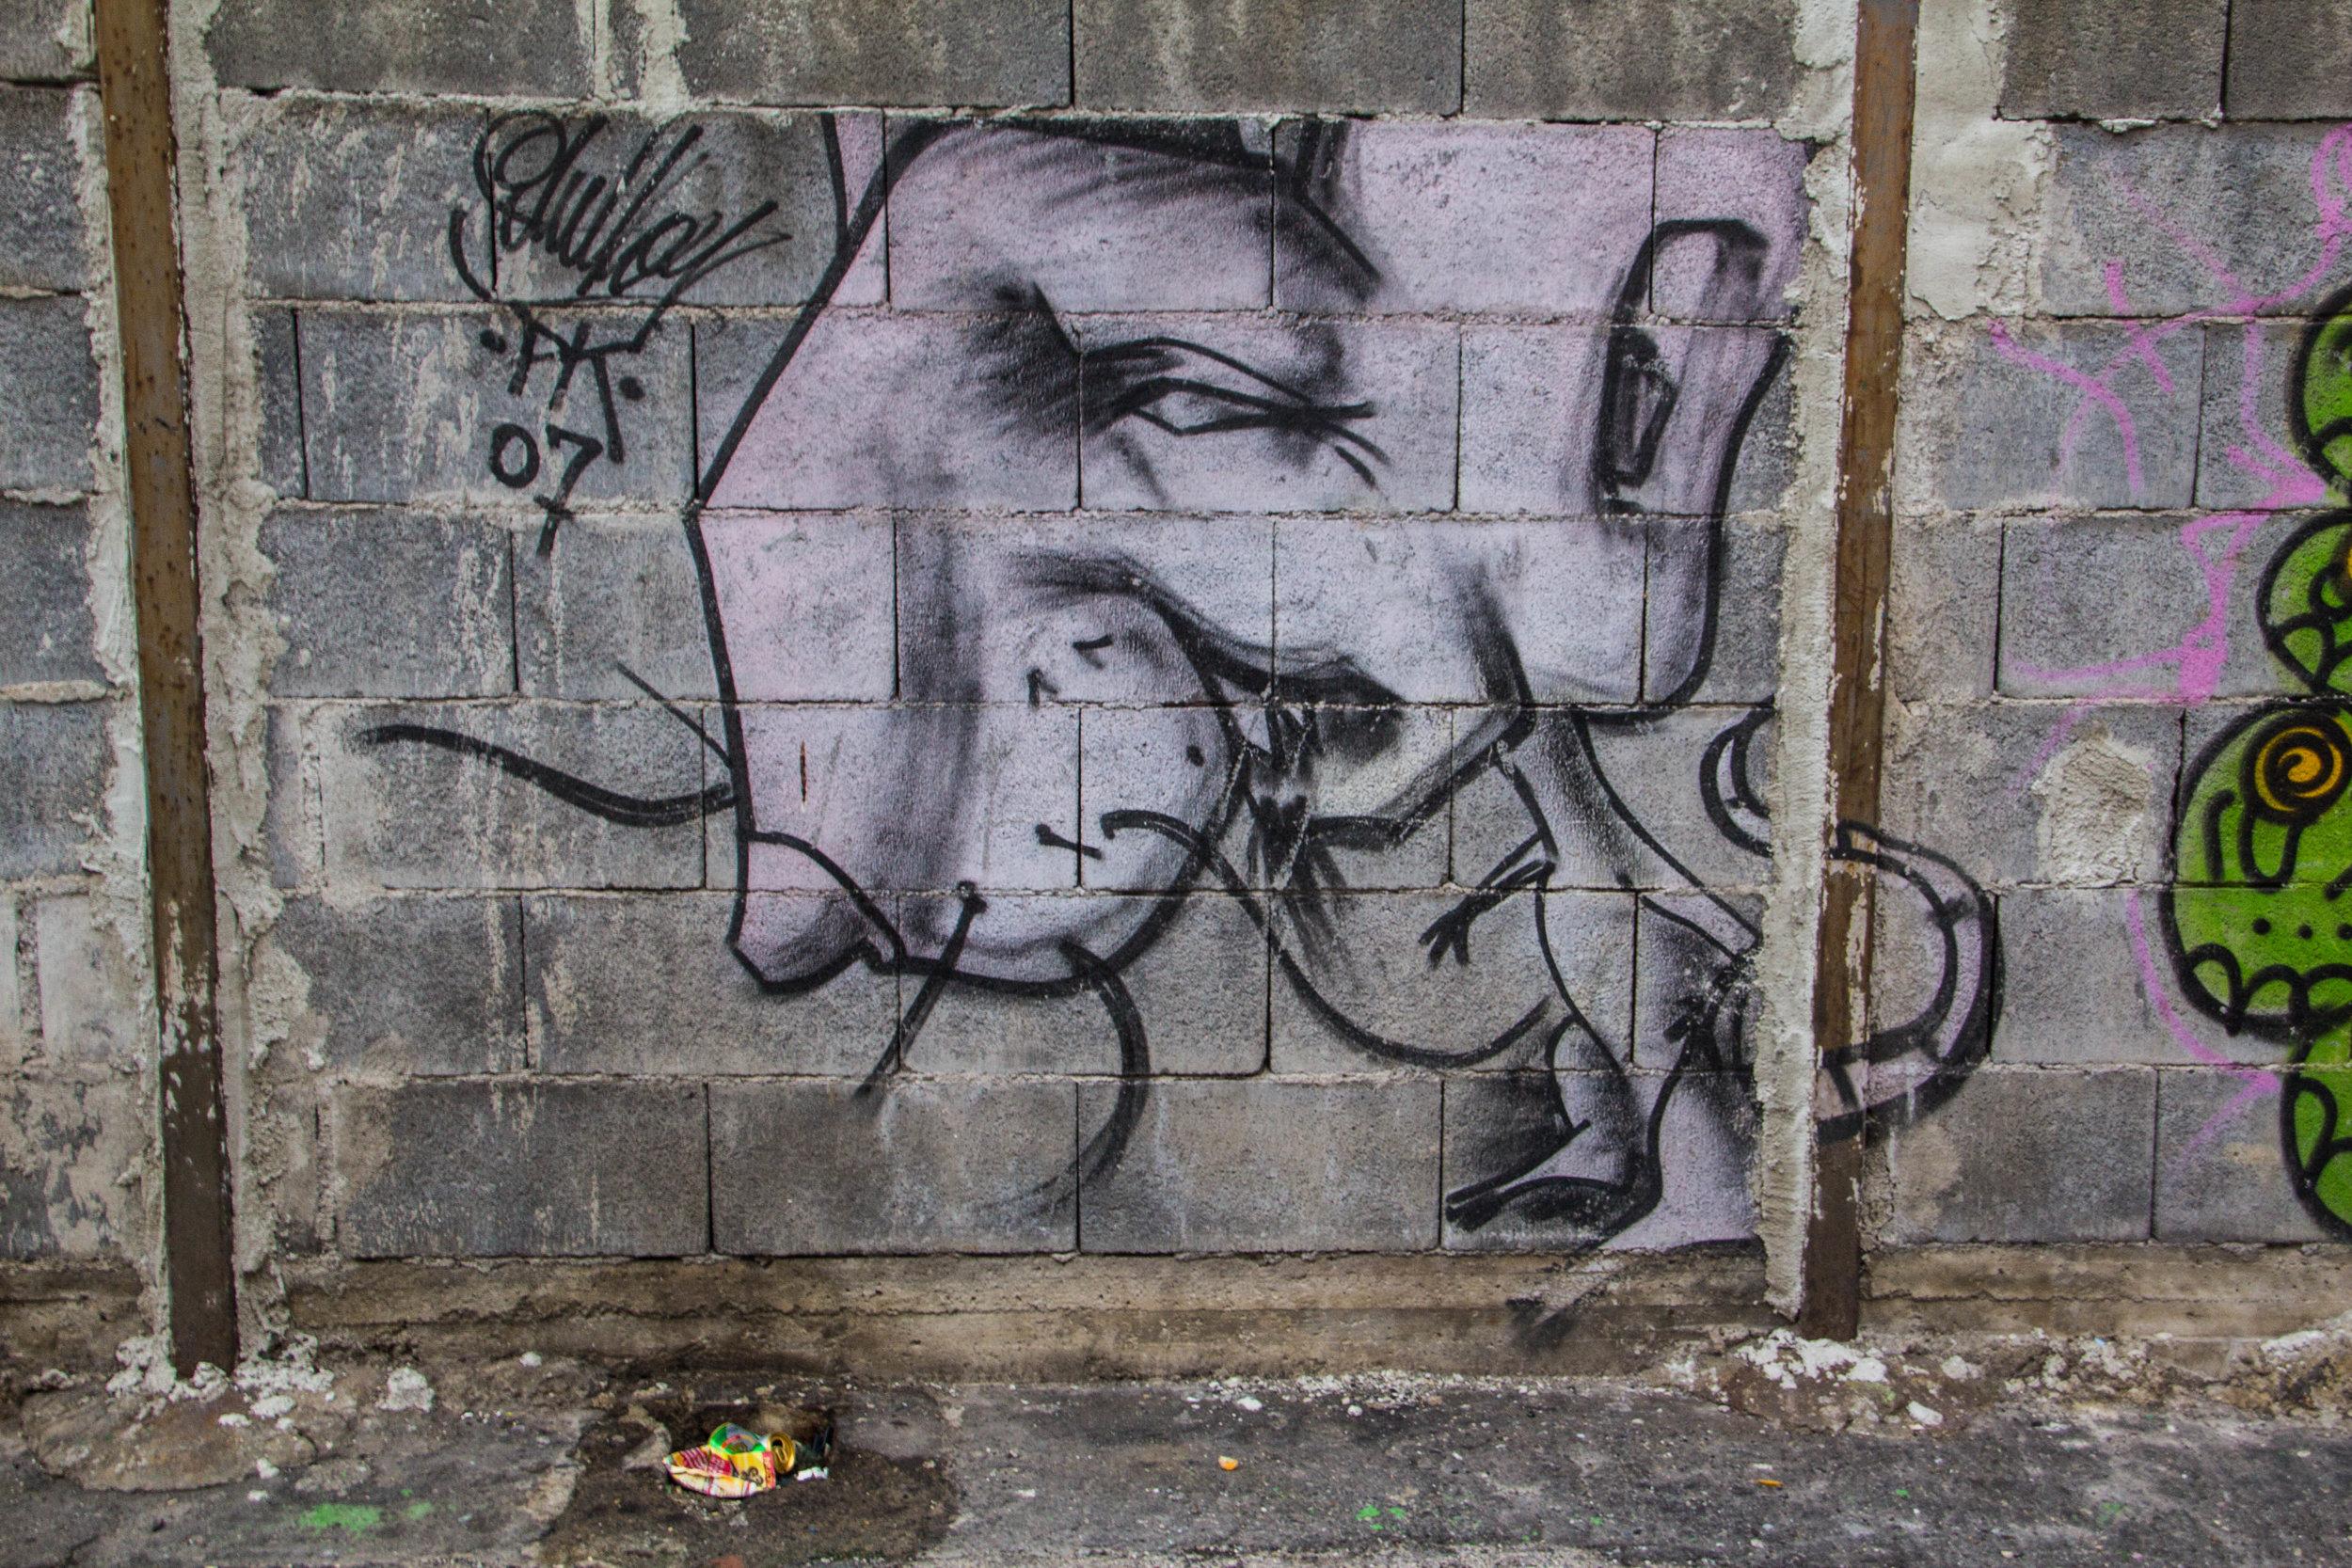 street-art-catania-sicily-sicilia-1.jpg